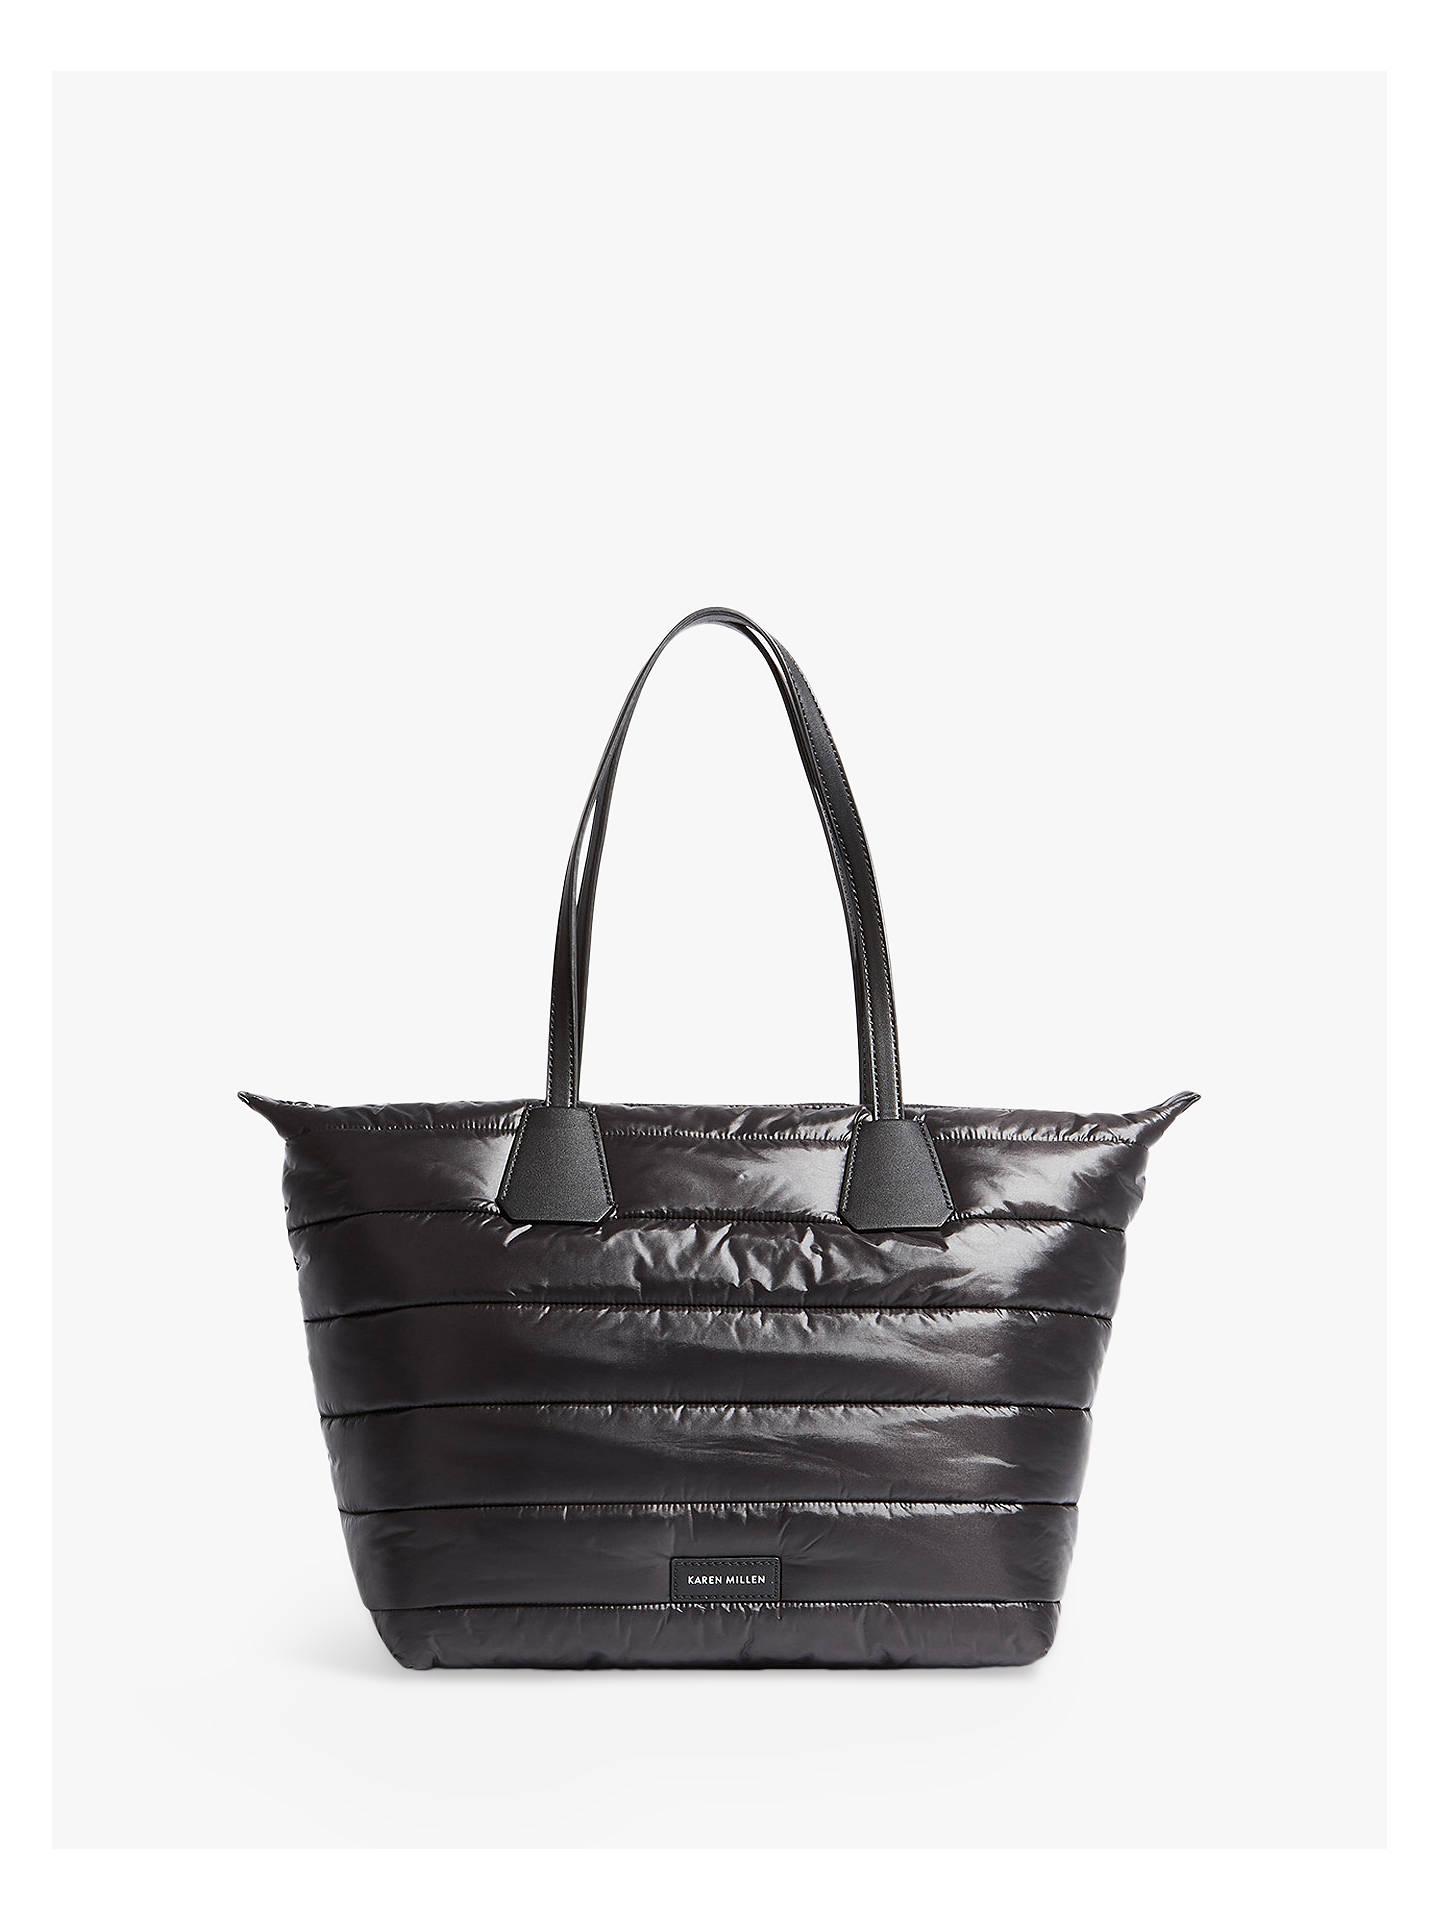 Karen Millen Quilted Tote Bag Black Online At Johnlewis